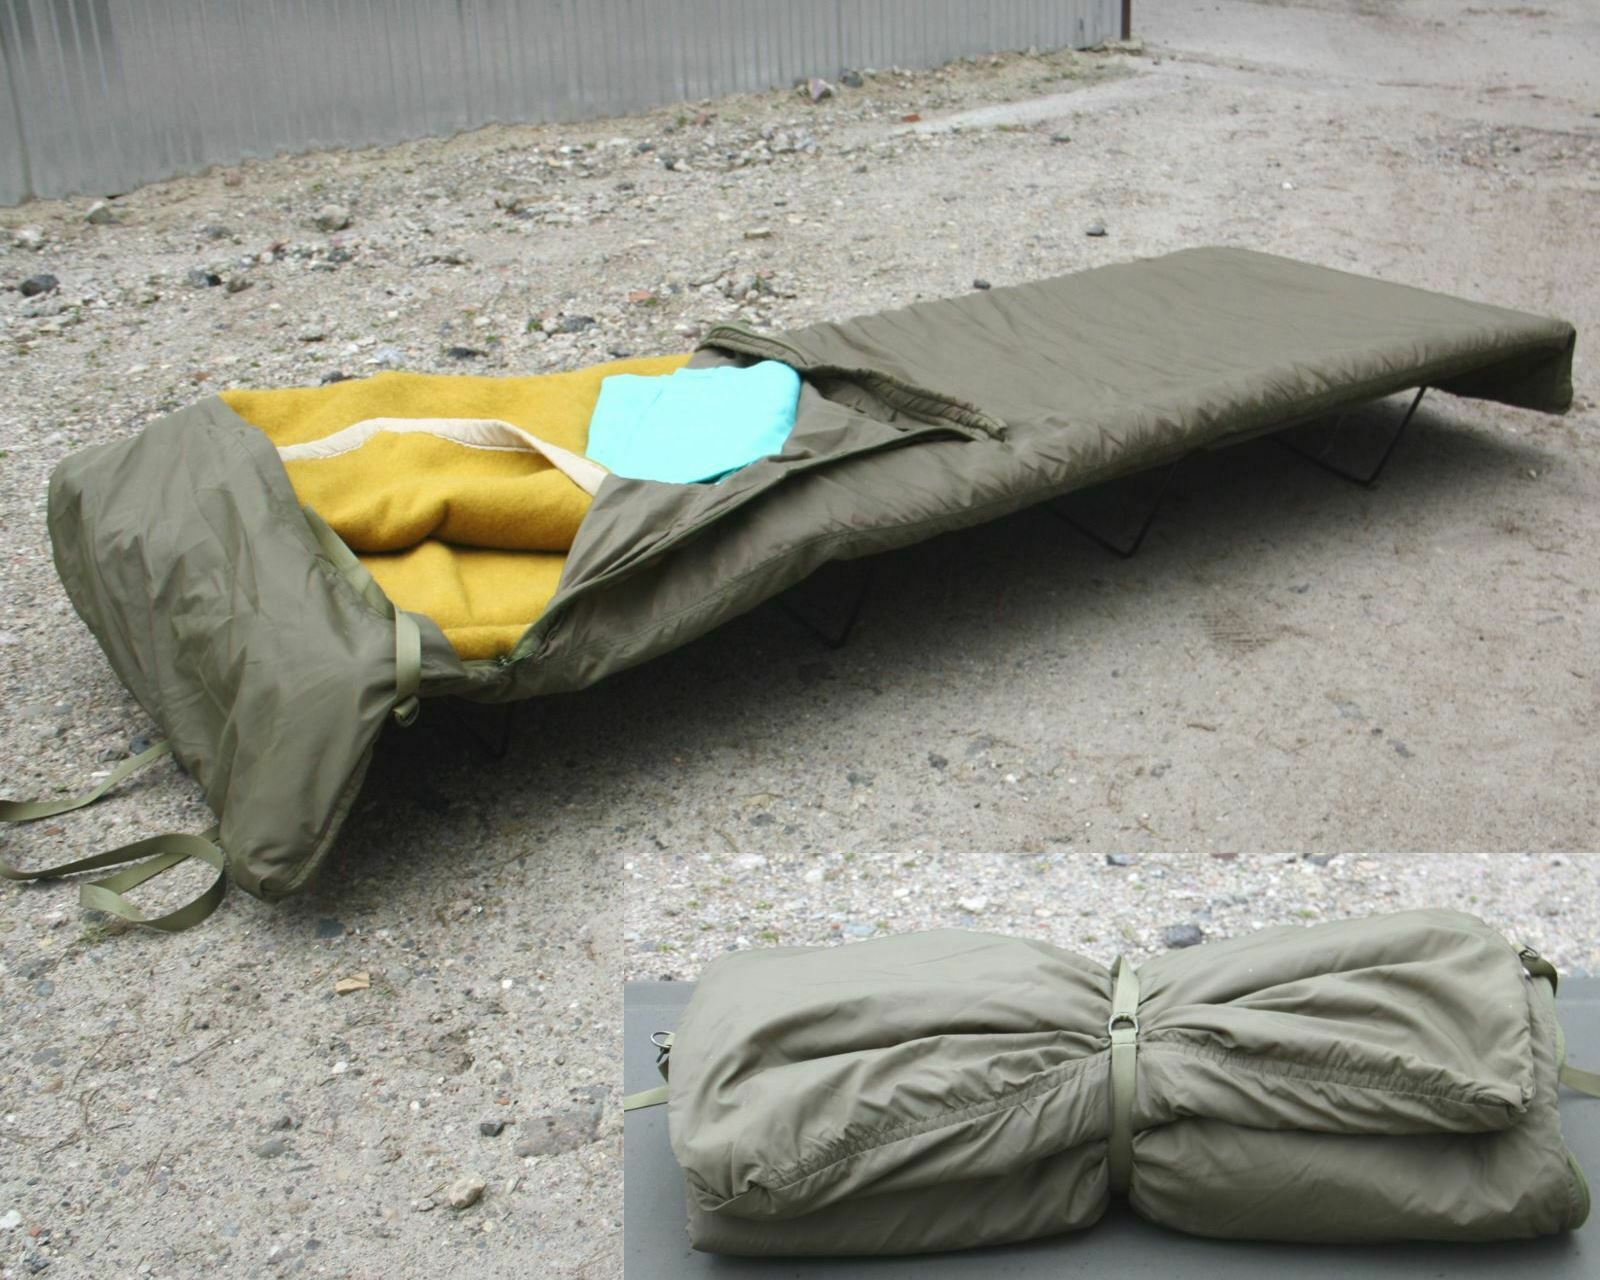 ORIGINAL CH SPATEN SCHNEESCHAUFEN ALU OUTDOOR CAMPING ANGELN NATO SCHWEIZ ARMEE